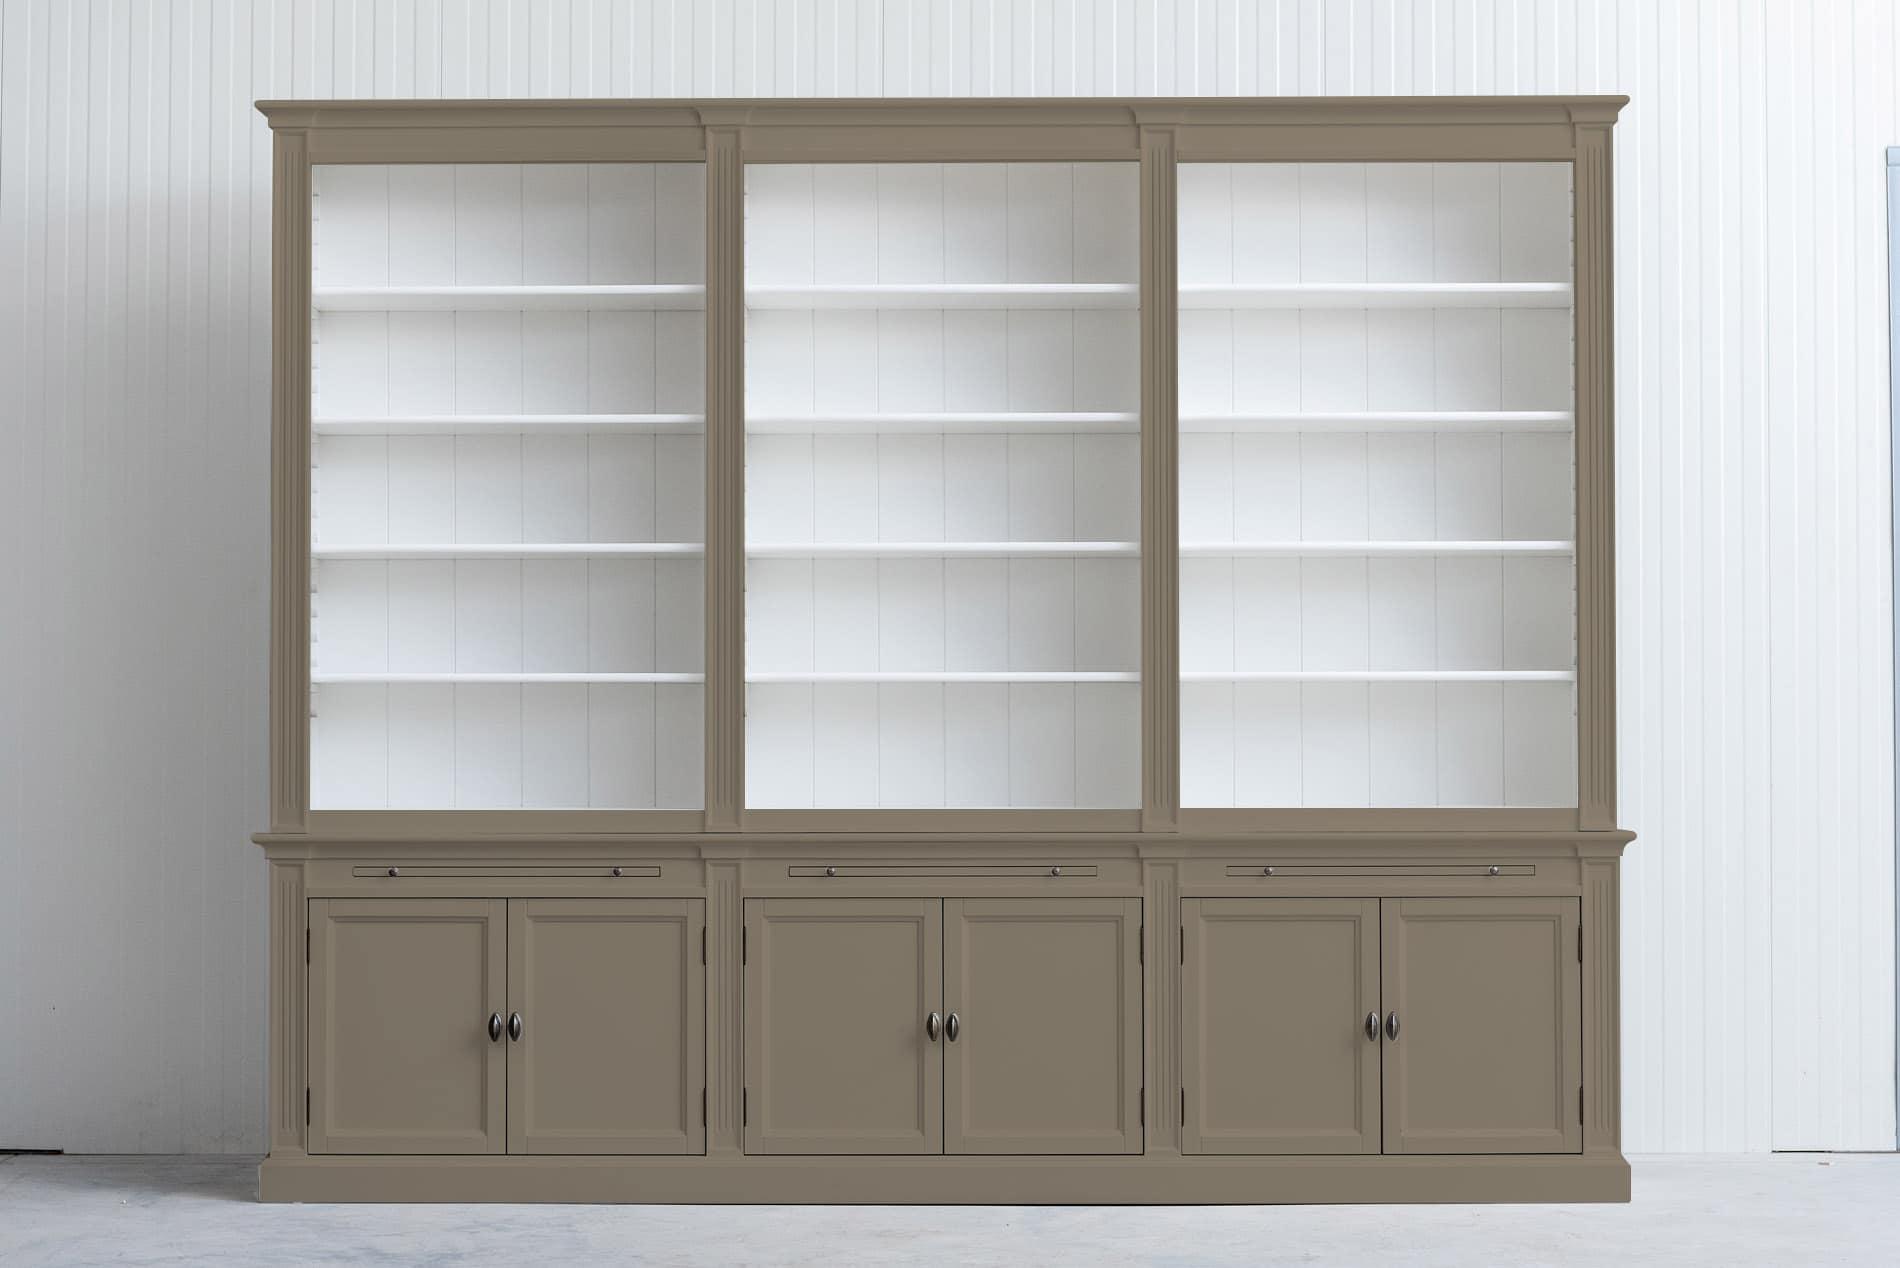 Landelijke boekenkast Bo 3×6 – Parelmoer grijs – RAL1035